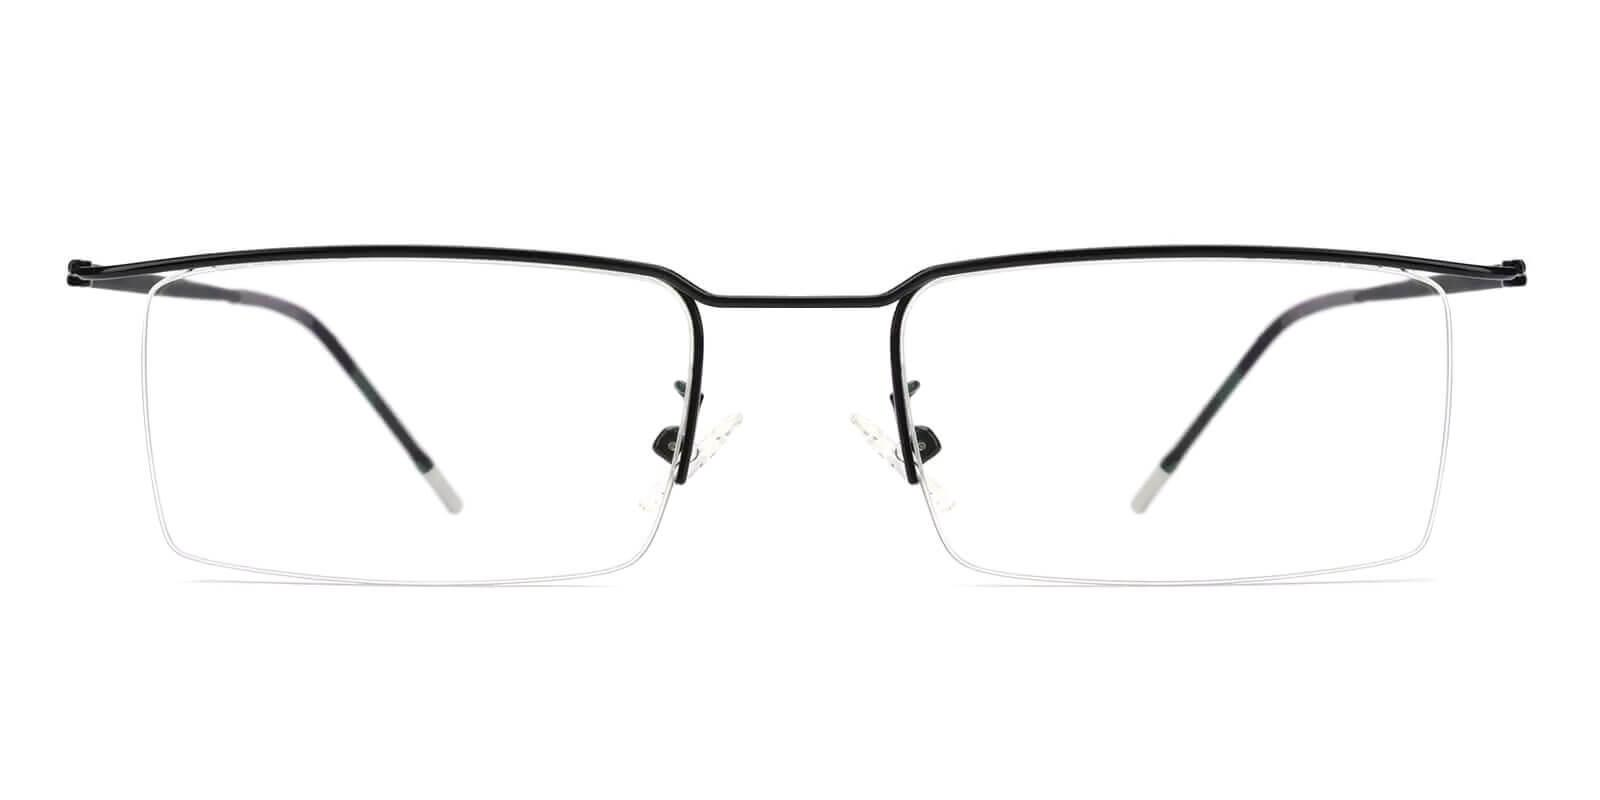 Wit Black Metal Eyeglasses , NosePads Frames from ABBE Glasses